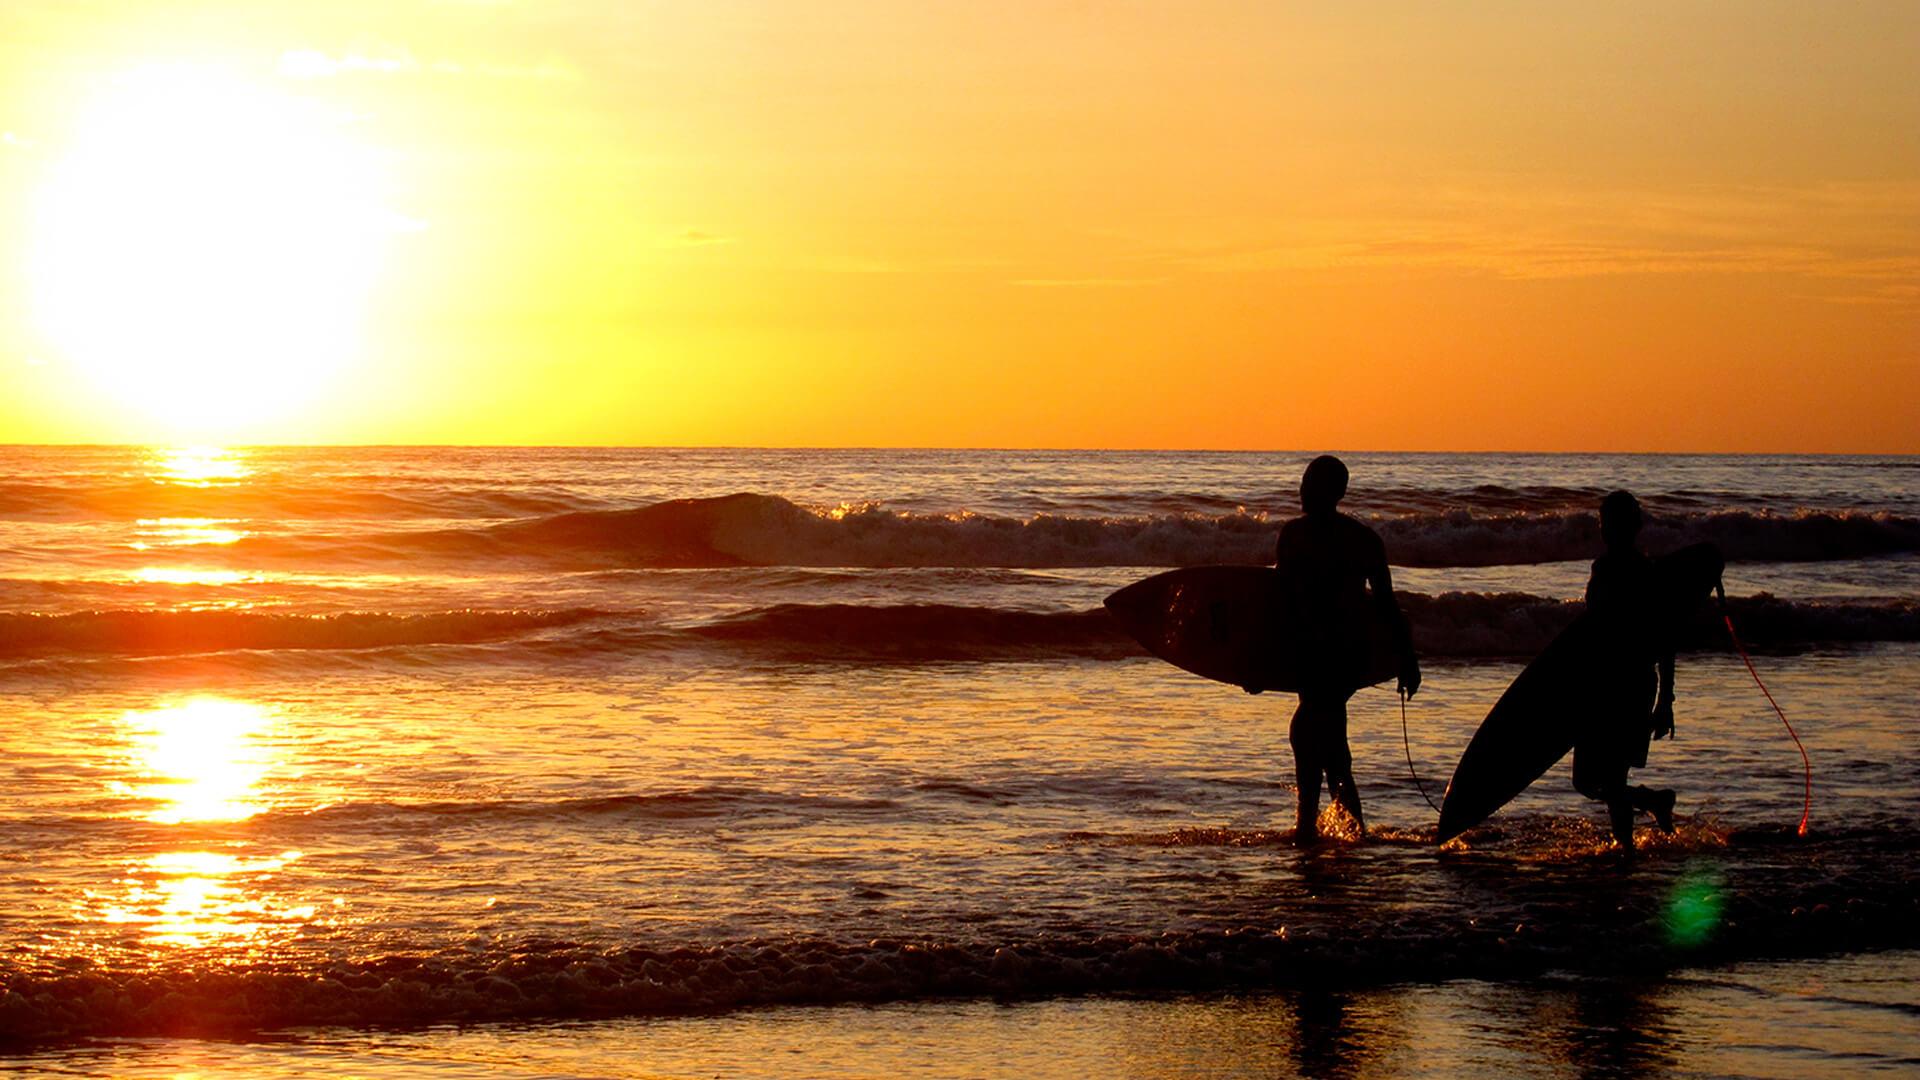 El Almejal surf